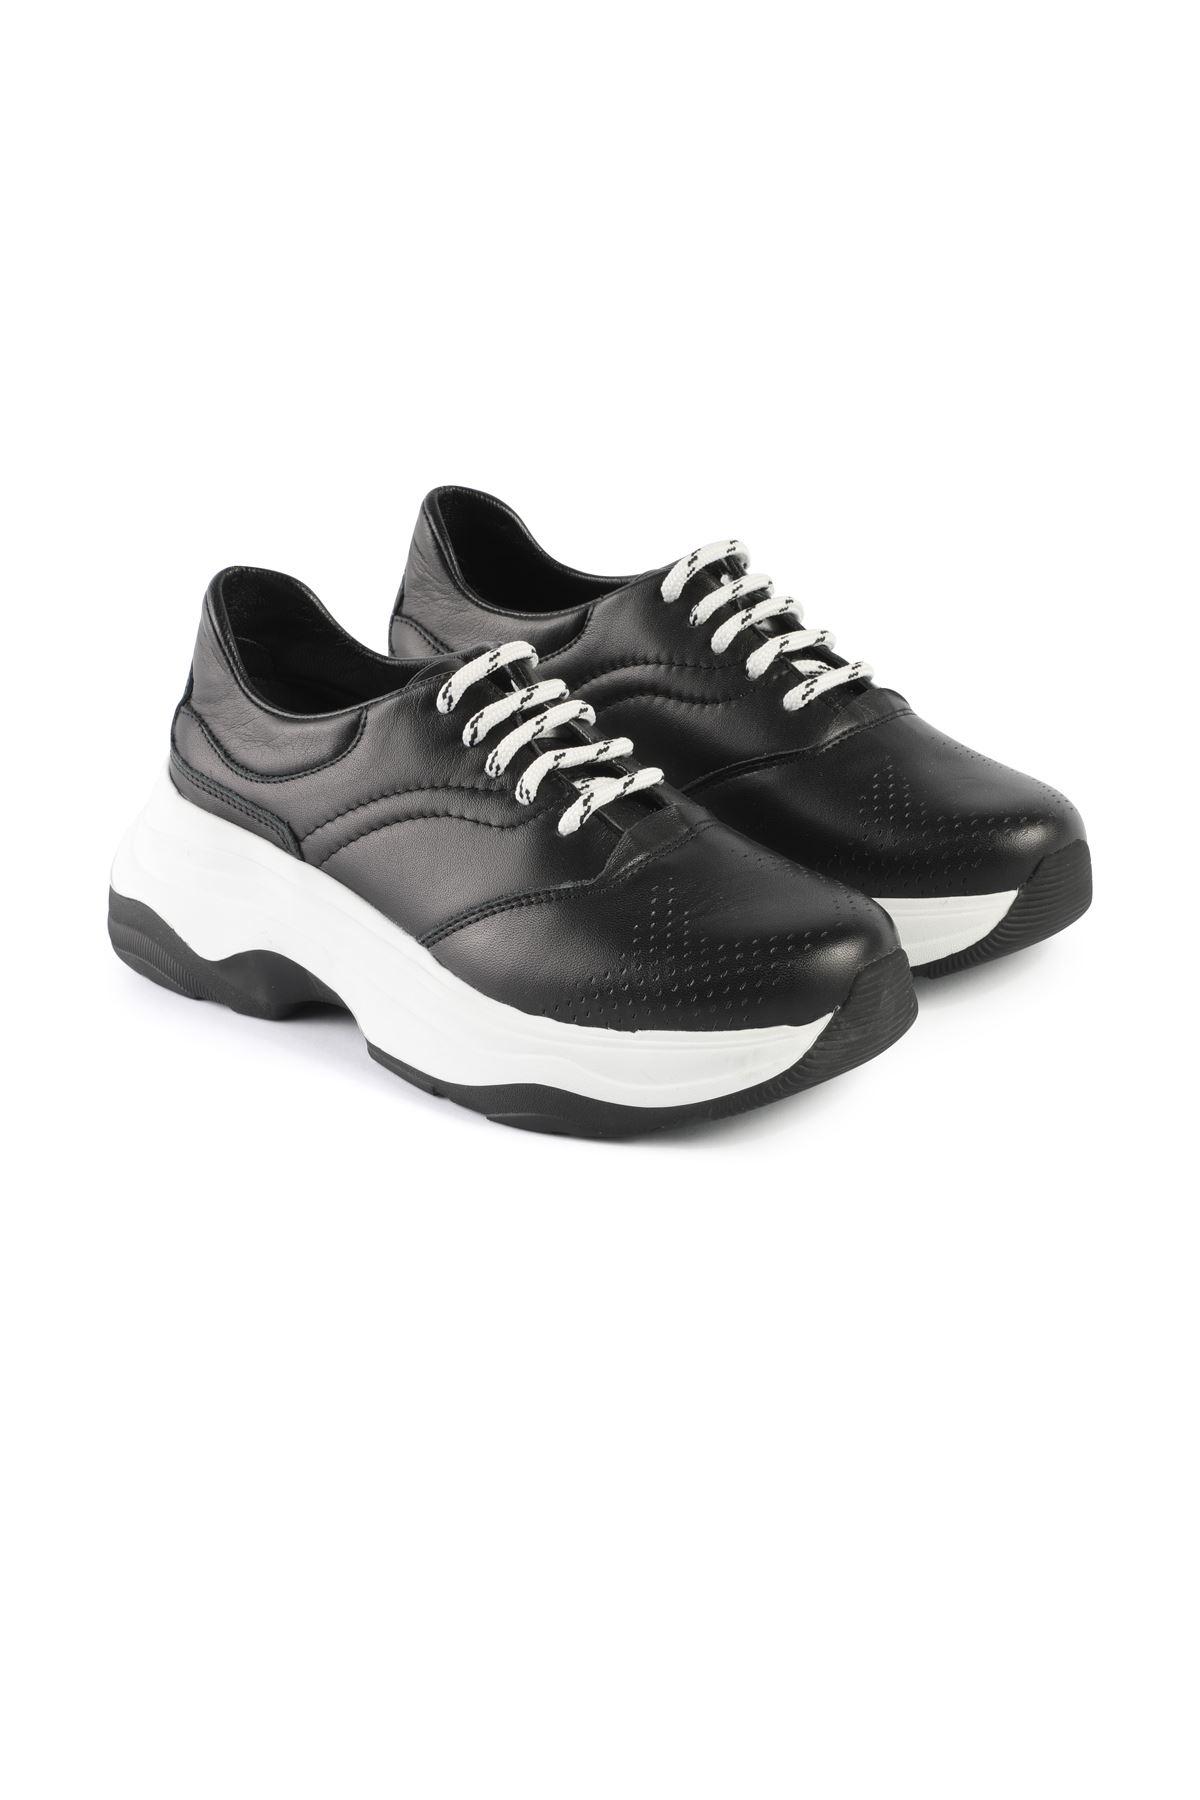 Libero AH019 Black Sports Shoes